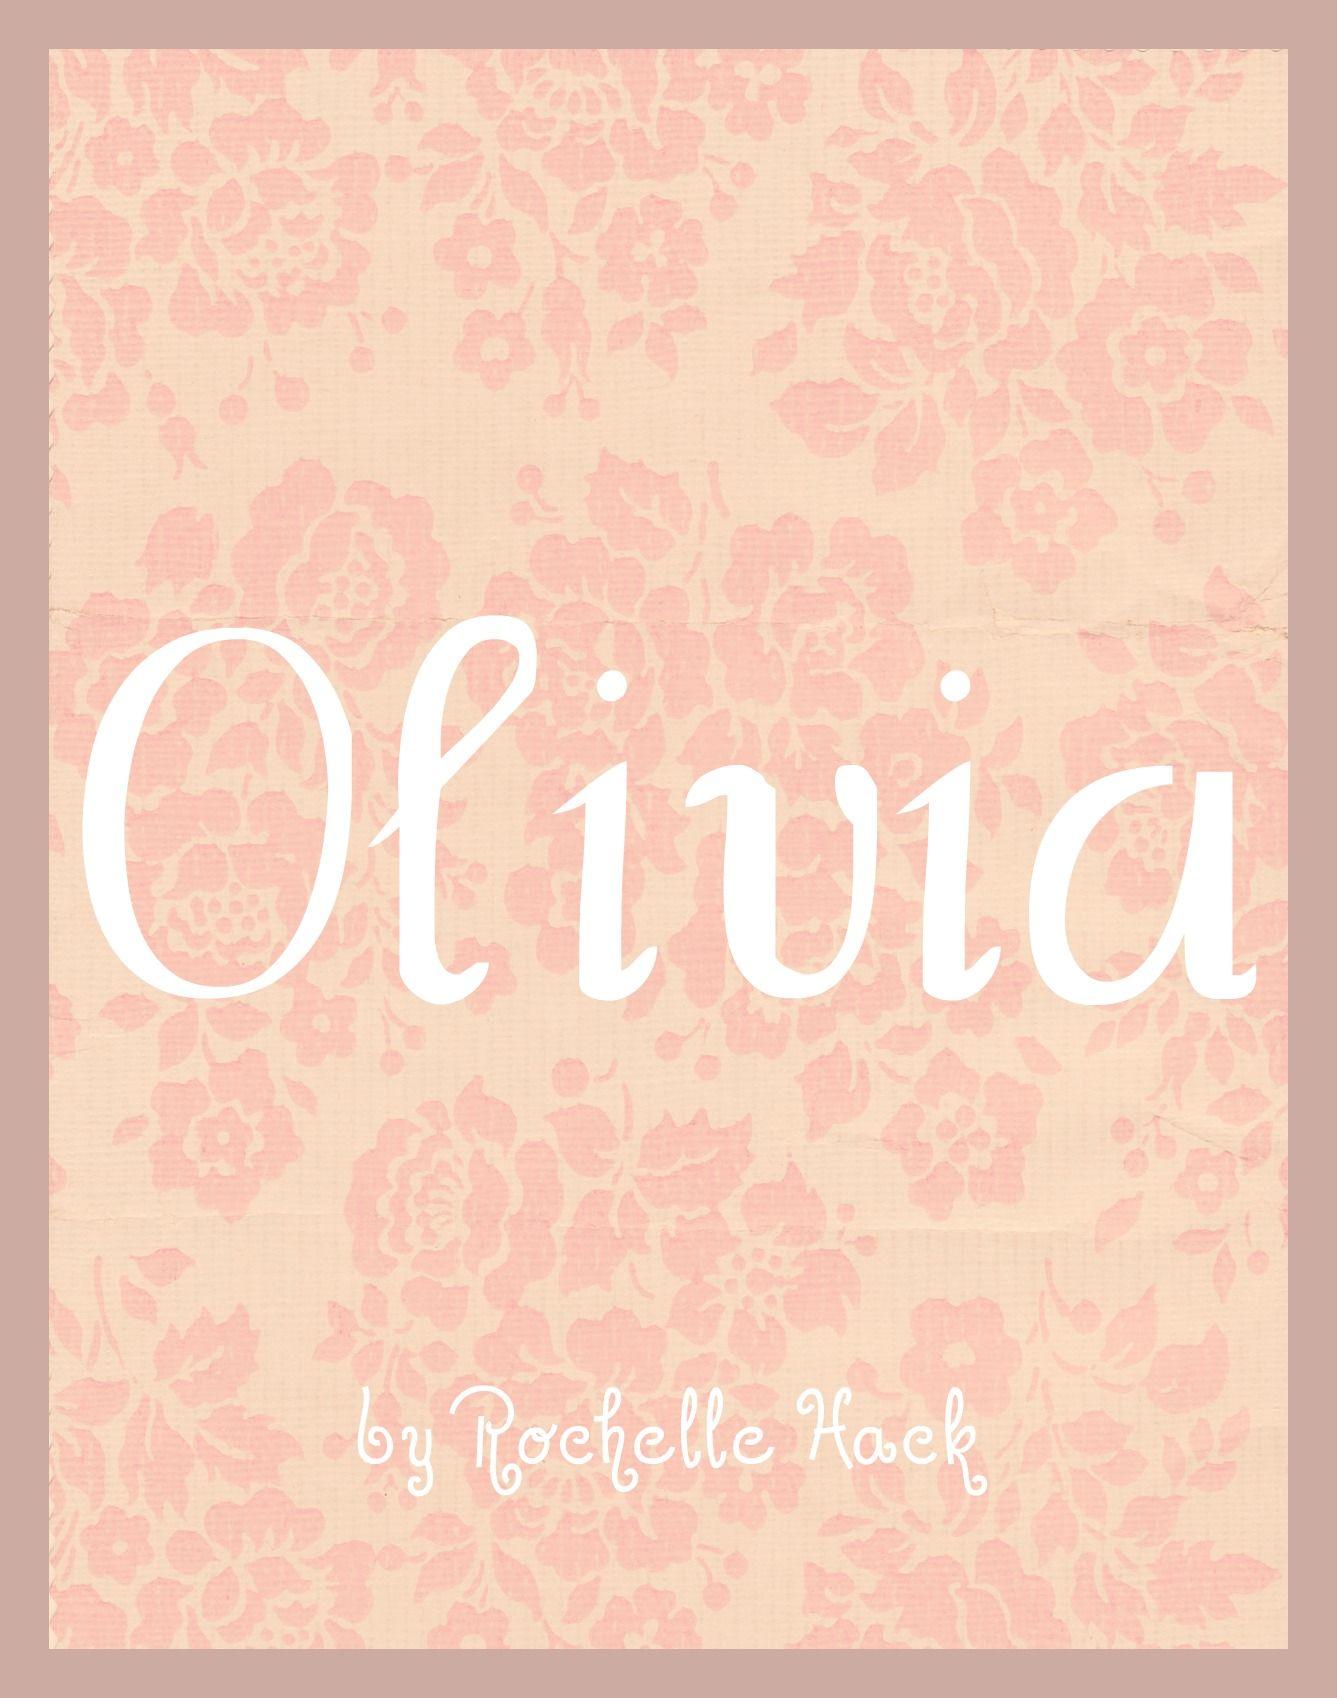 olivia single hispanic girls Free to join & browse - 1000's of latino women - interracial dating for men & women - black, white, latino, asian, everyone.